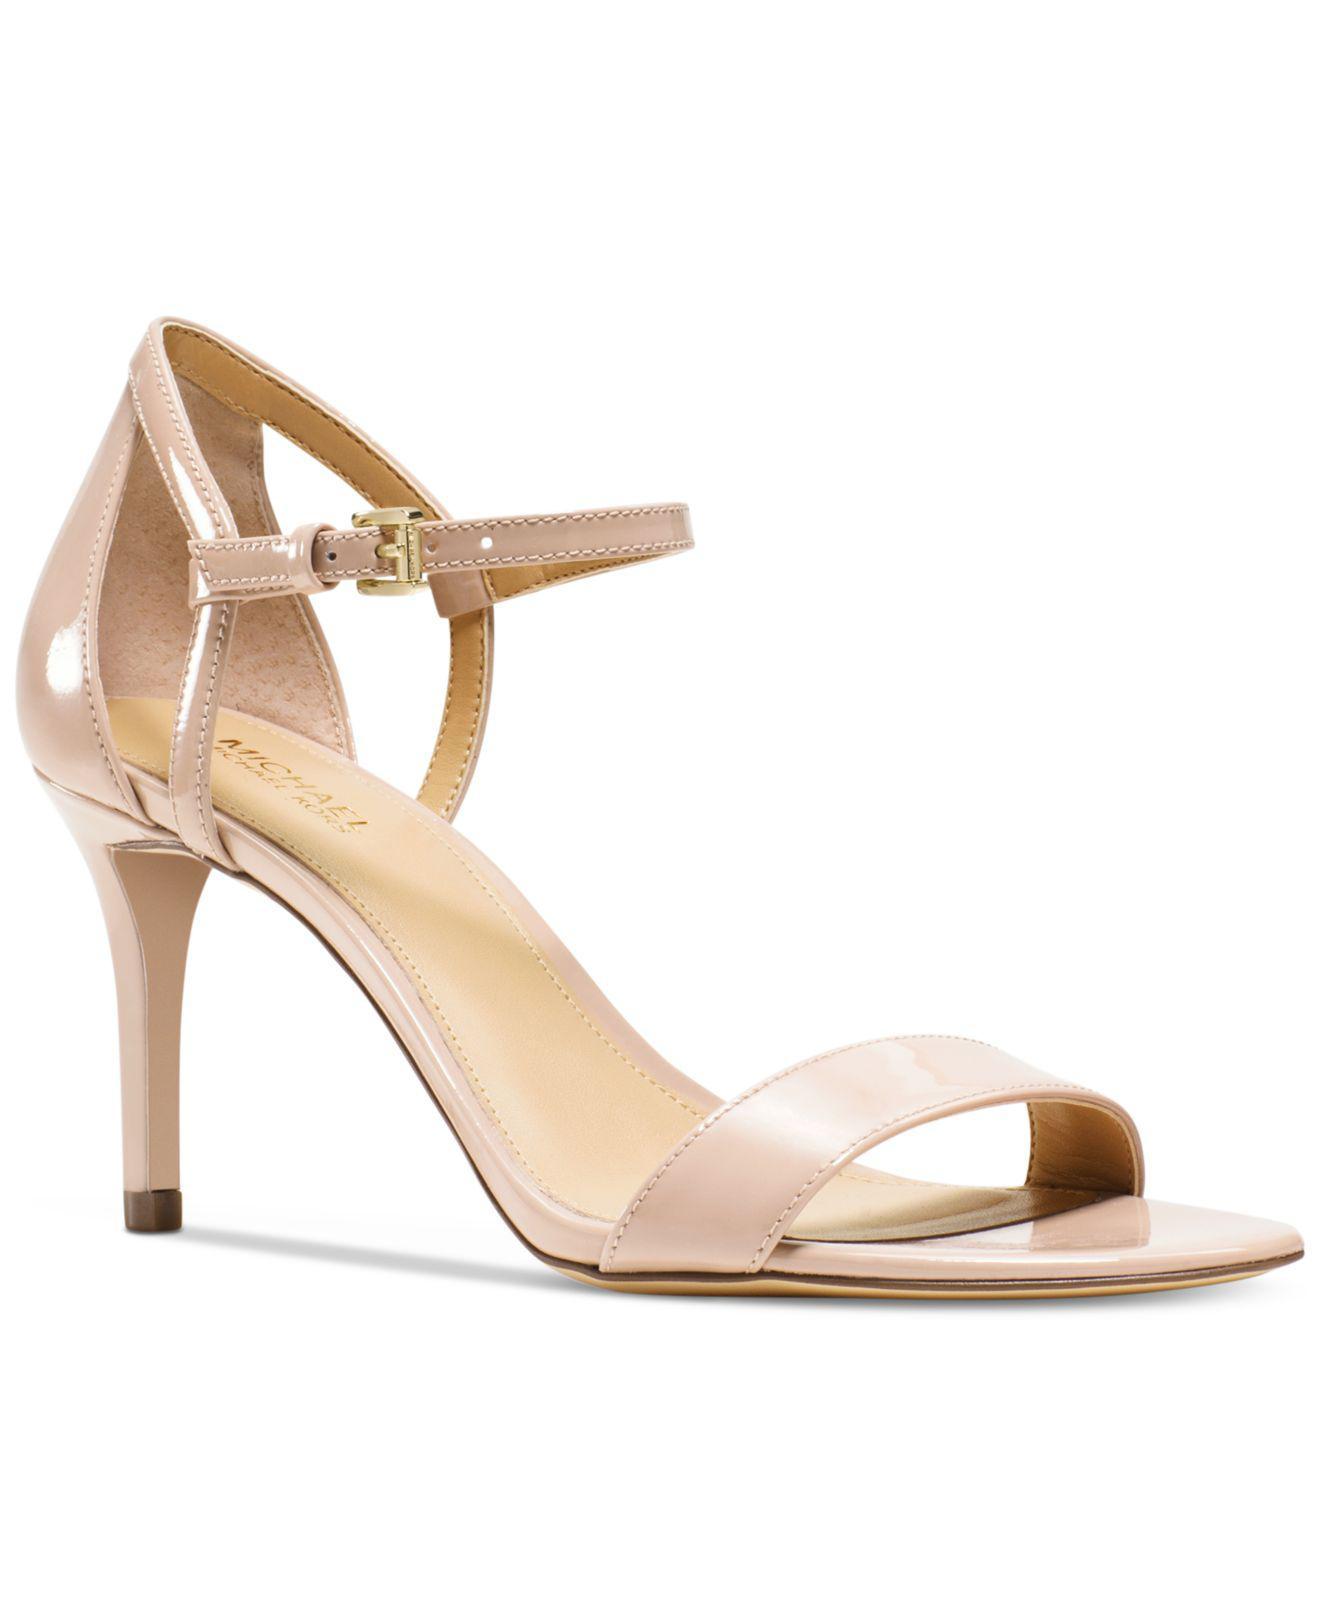 a0231d563f7d Lyst - Michael Kors Simone Dress Sandals - Save 2%